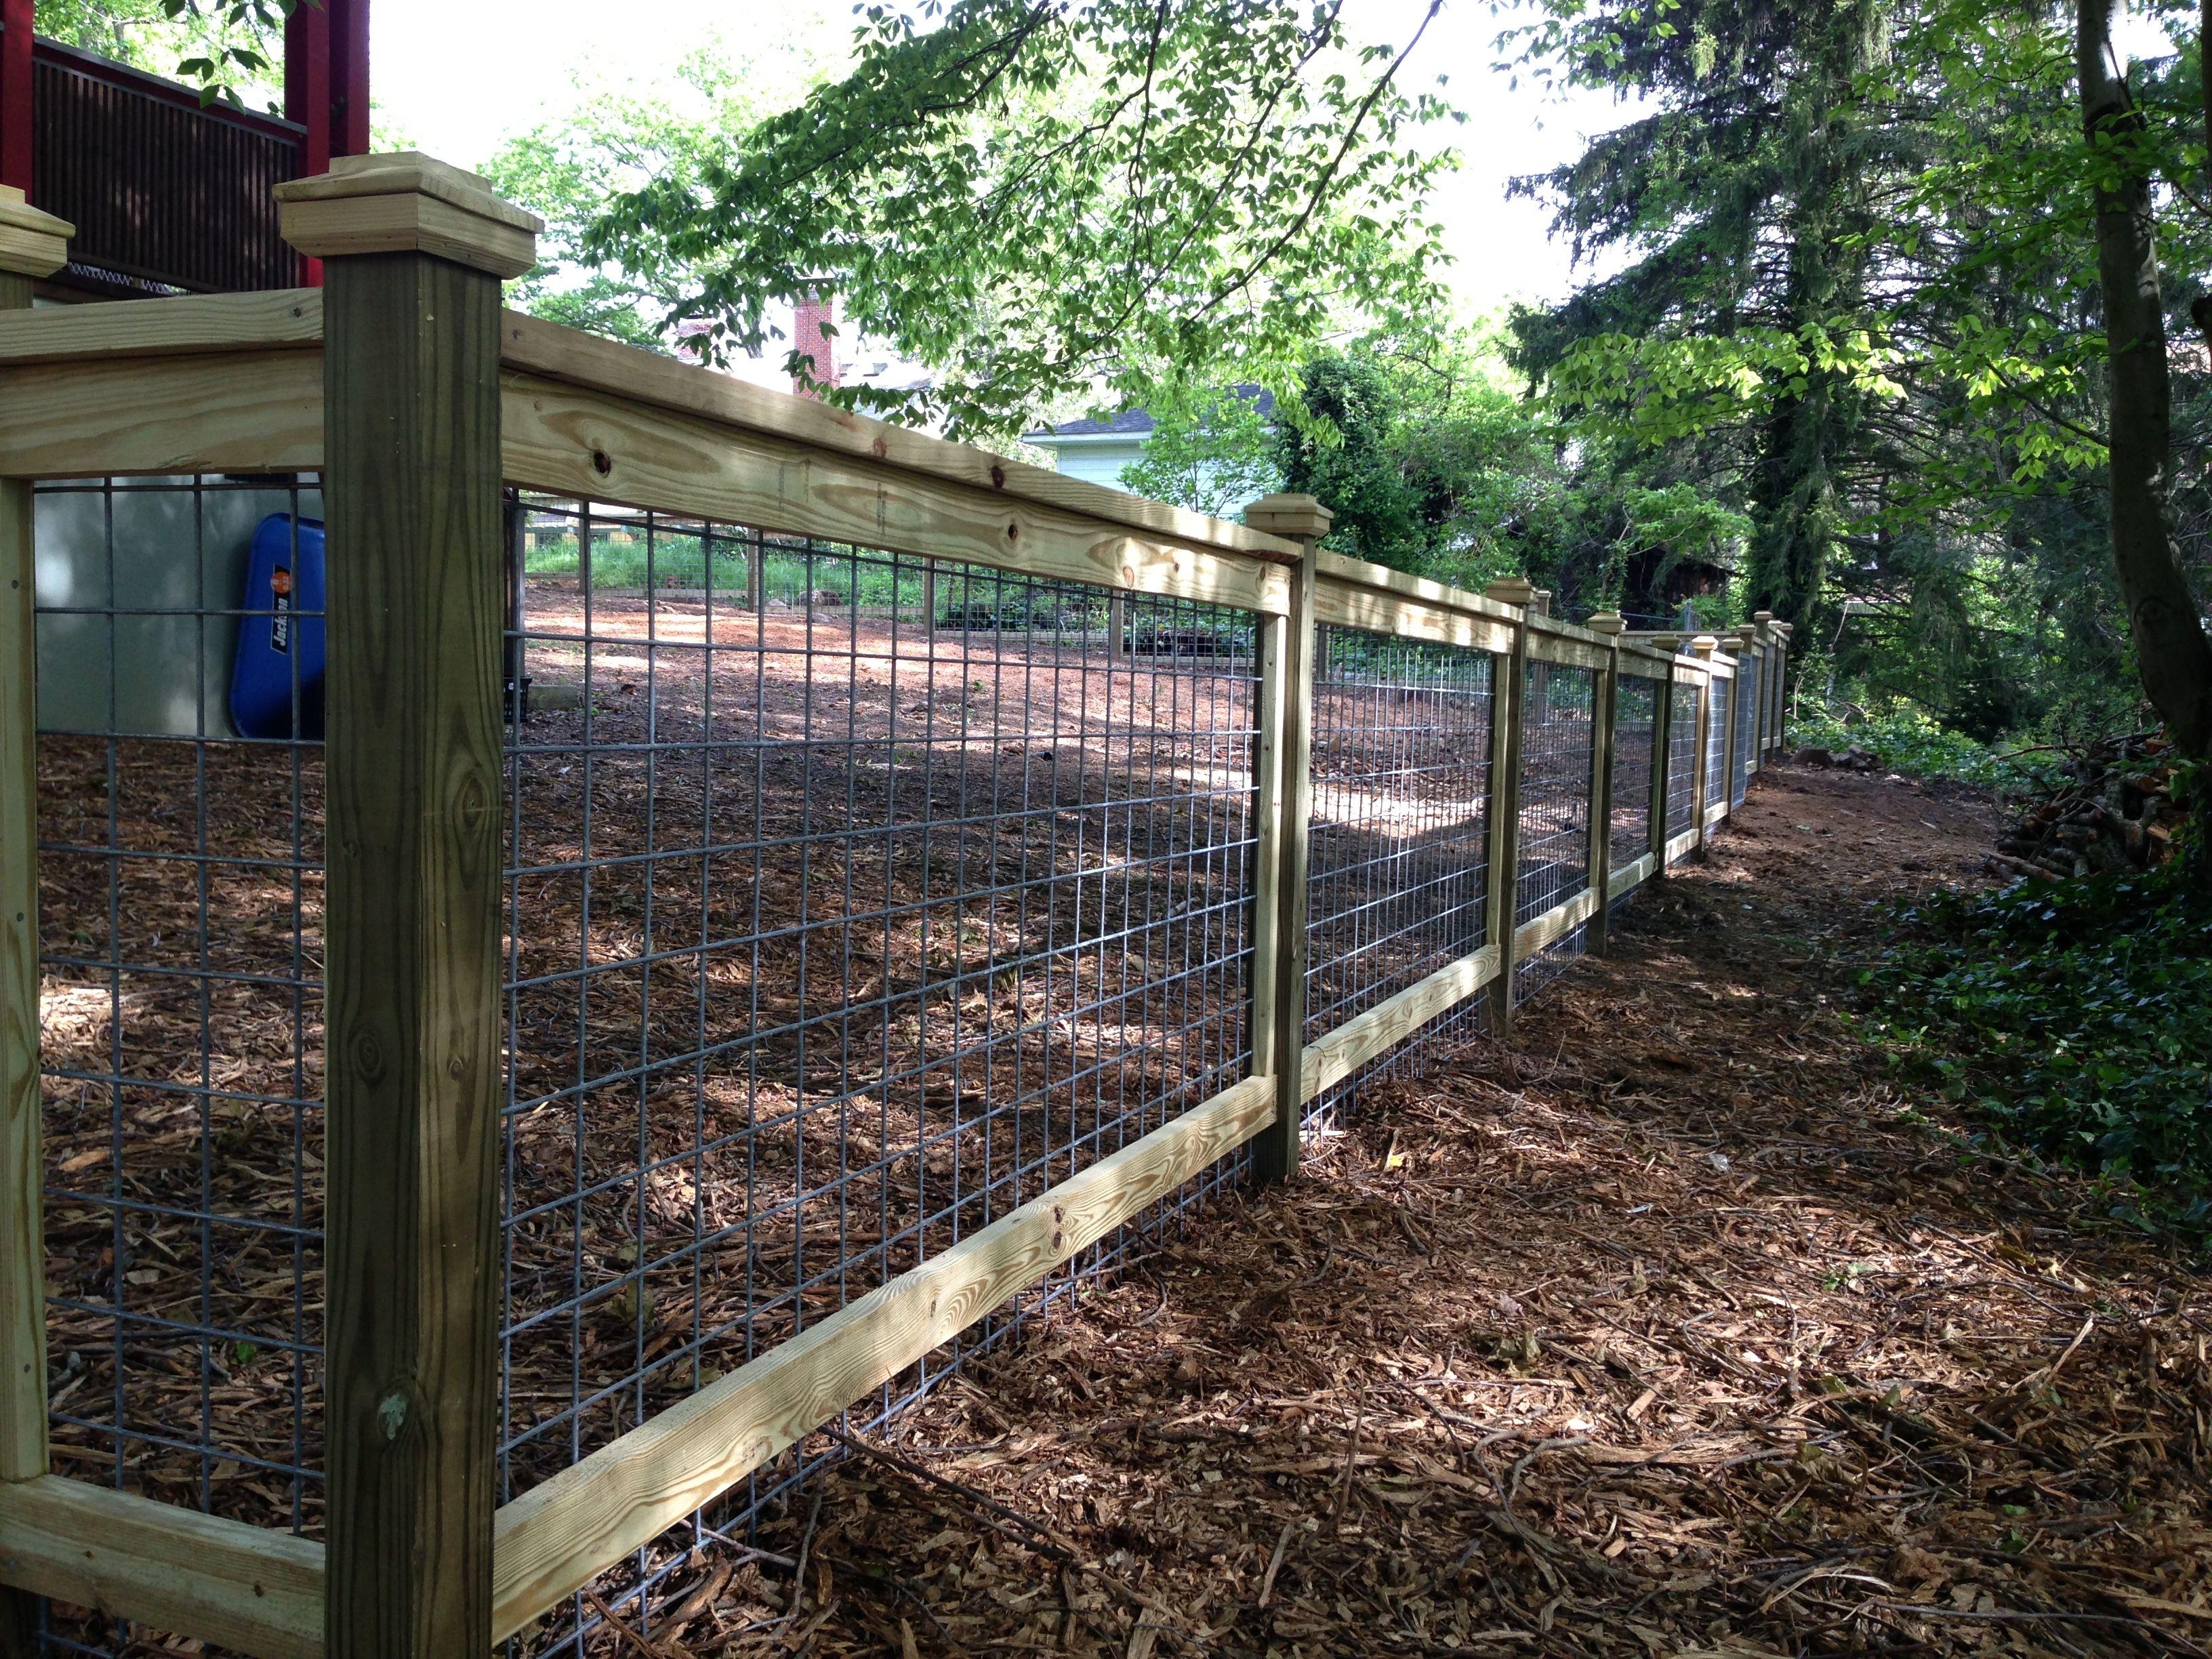 Feedlot Panel Fence Garden Fencing Farm Fence Hardscape